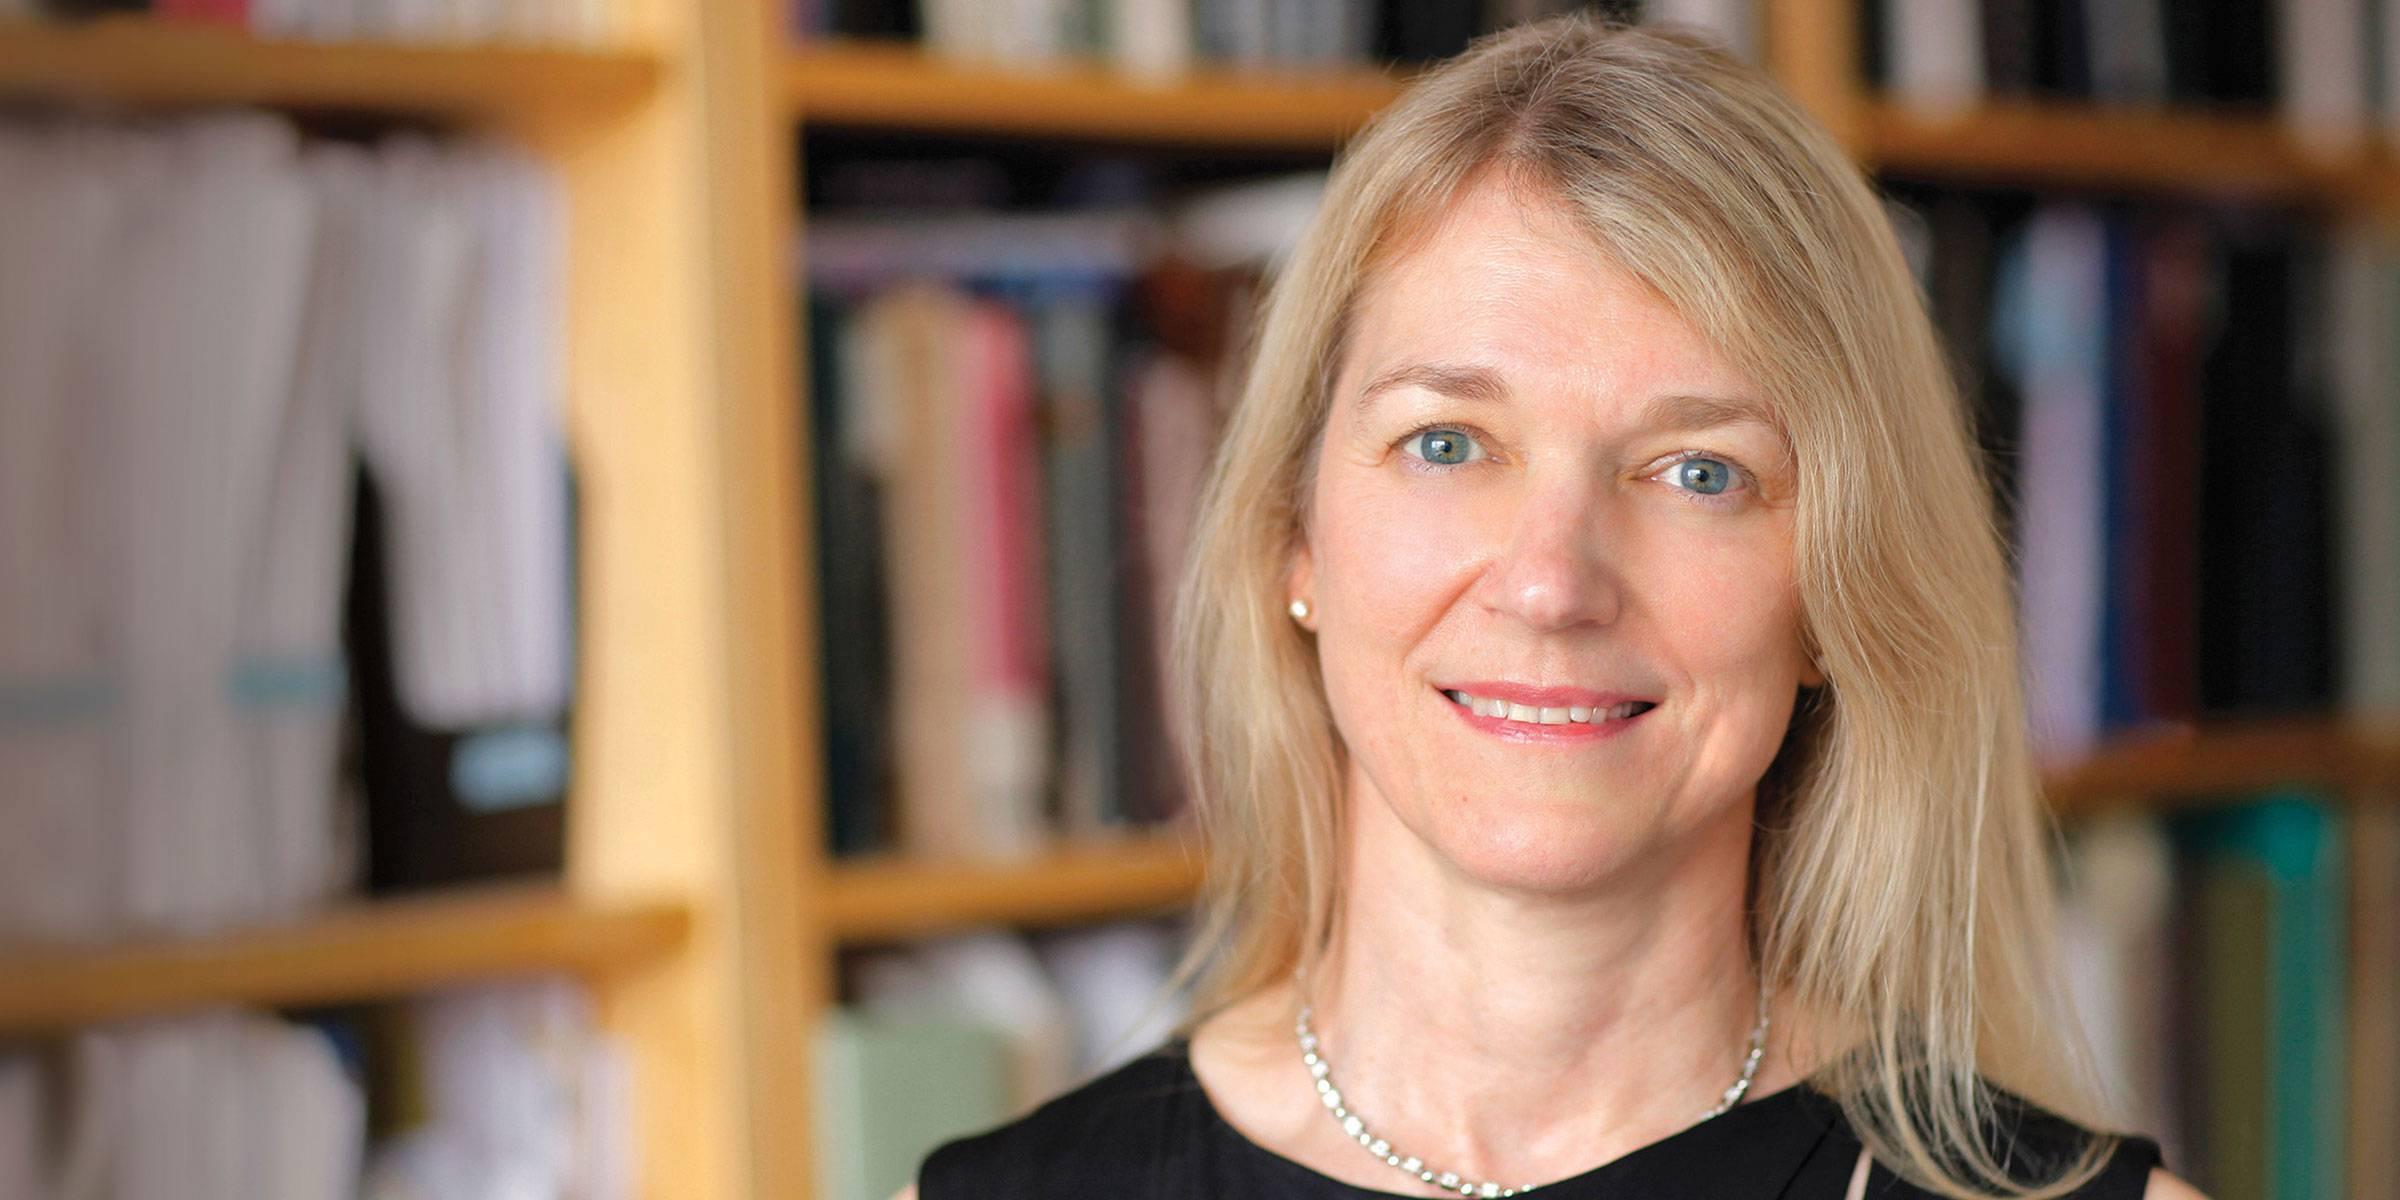 Cori Bargmann, Ph.D.